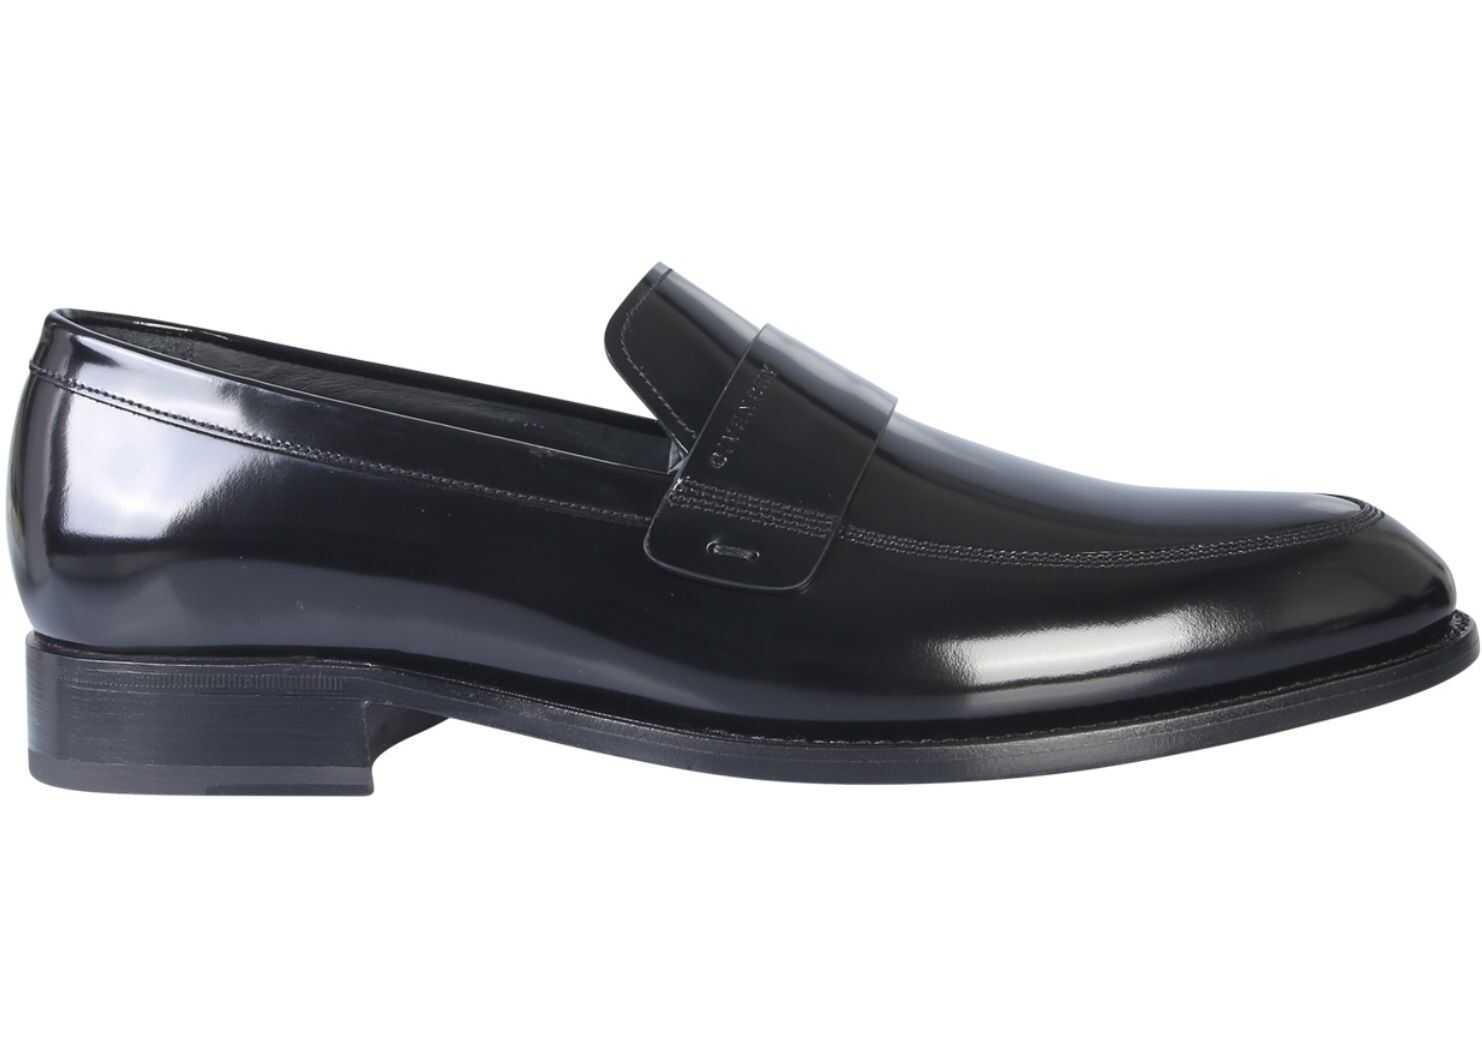 Givenchy Leather Loafer BLACK